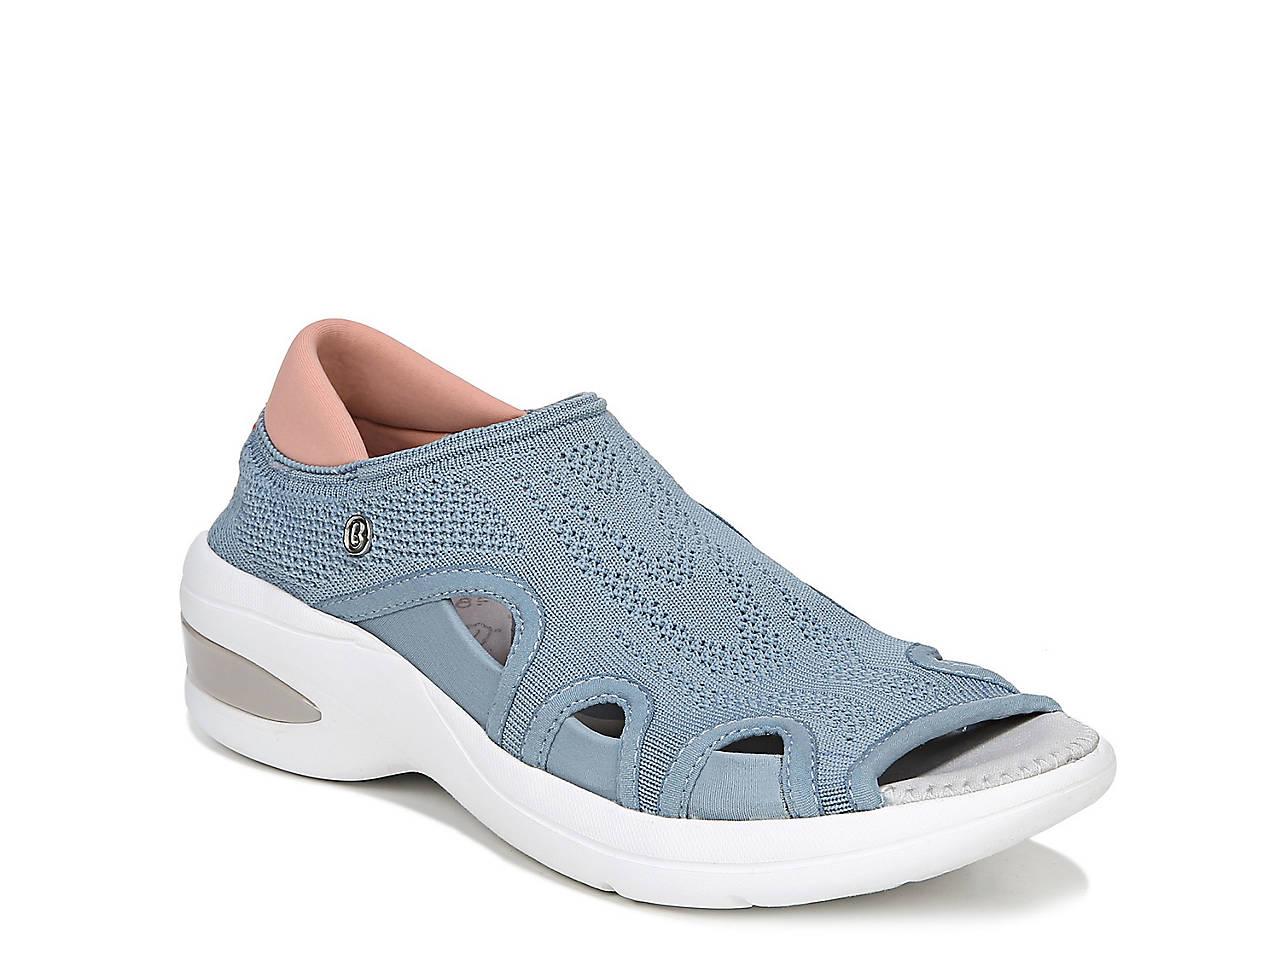 06ce7b6bcaf2 BZees Resort Wedge Slip-On Women s Shoes